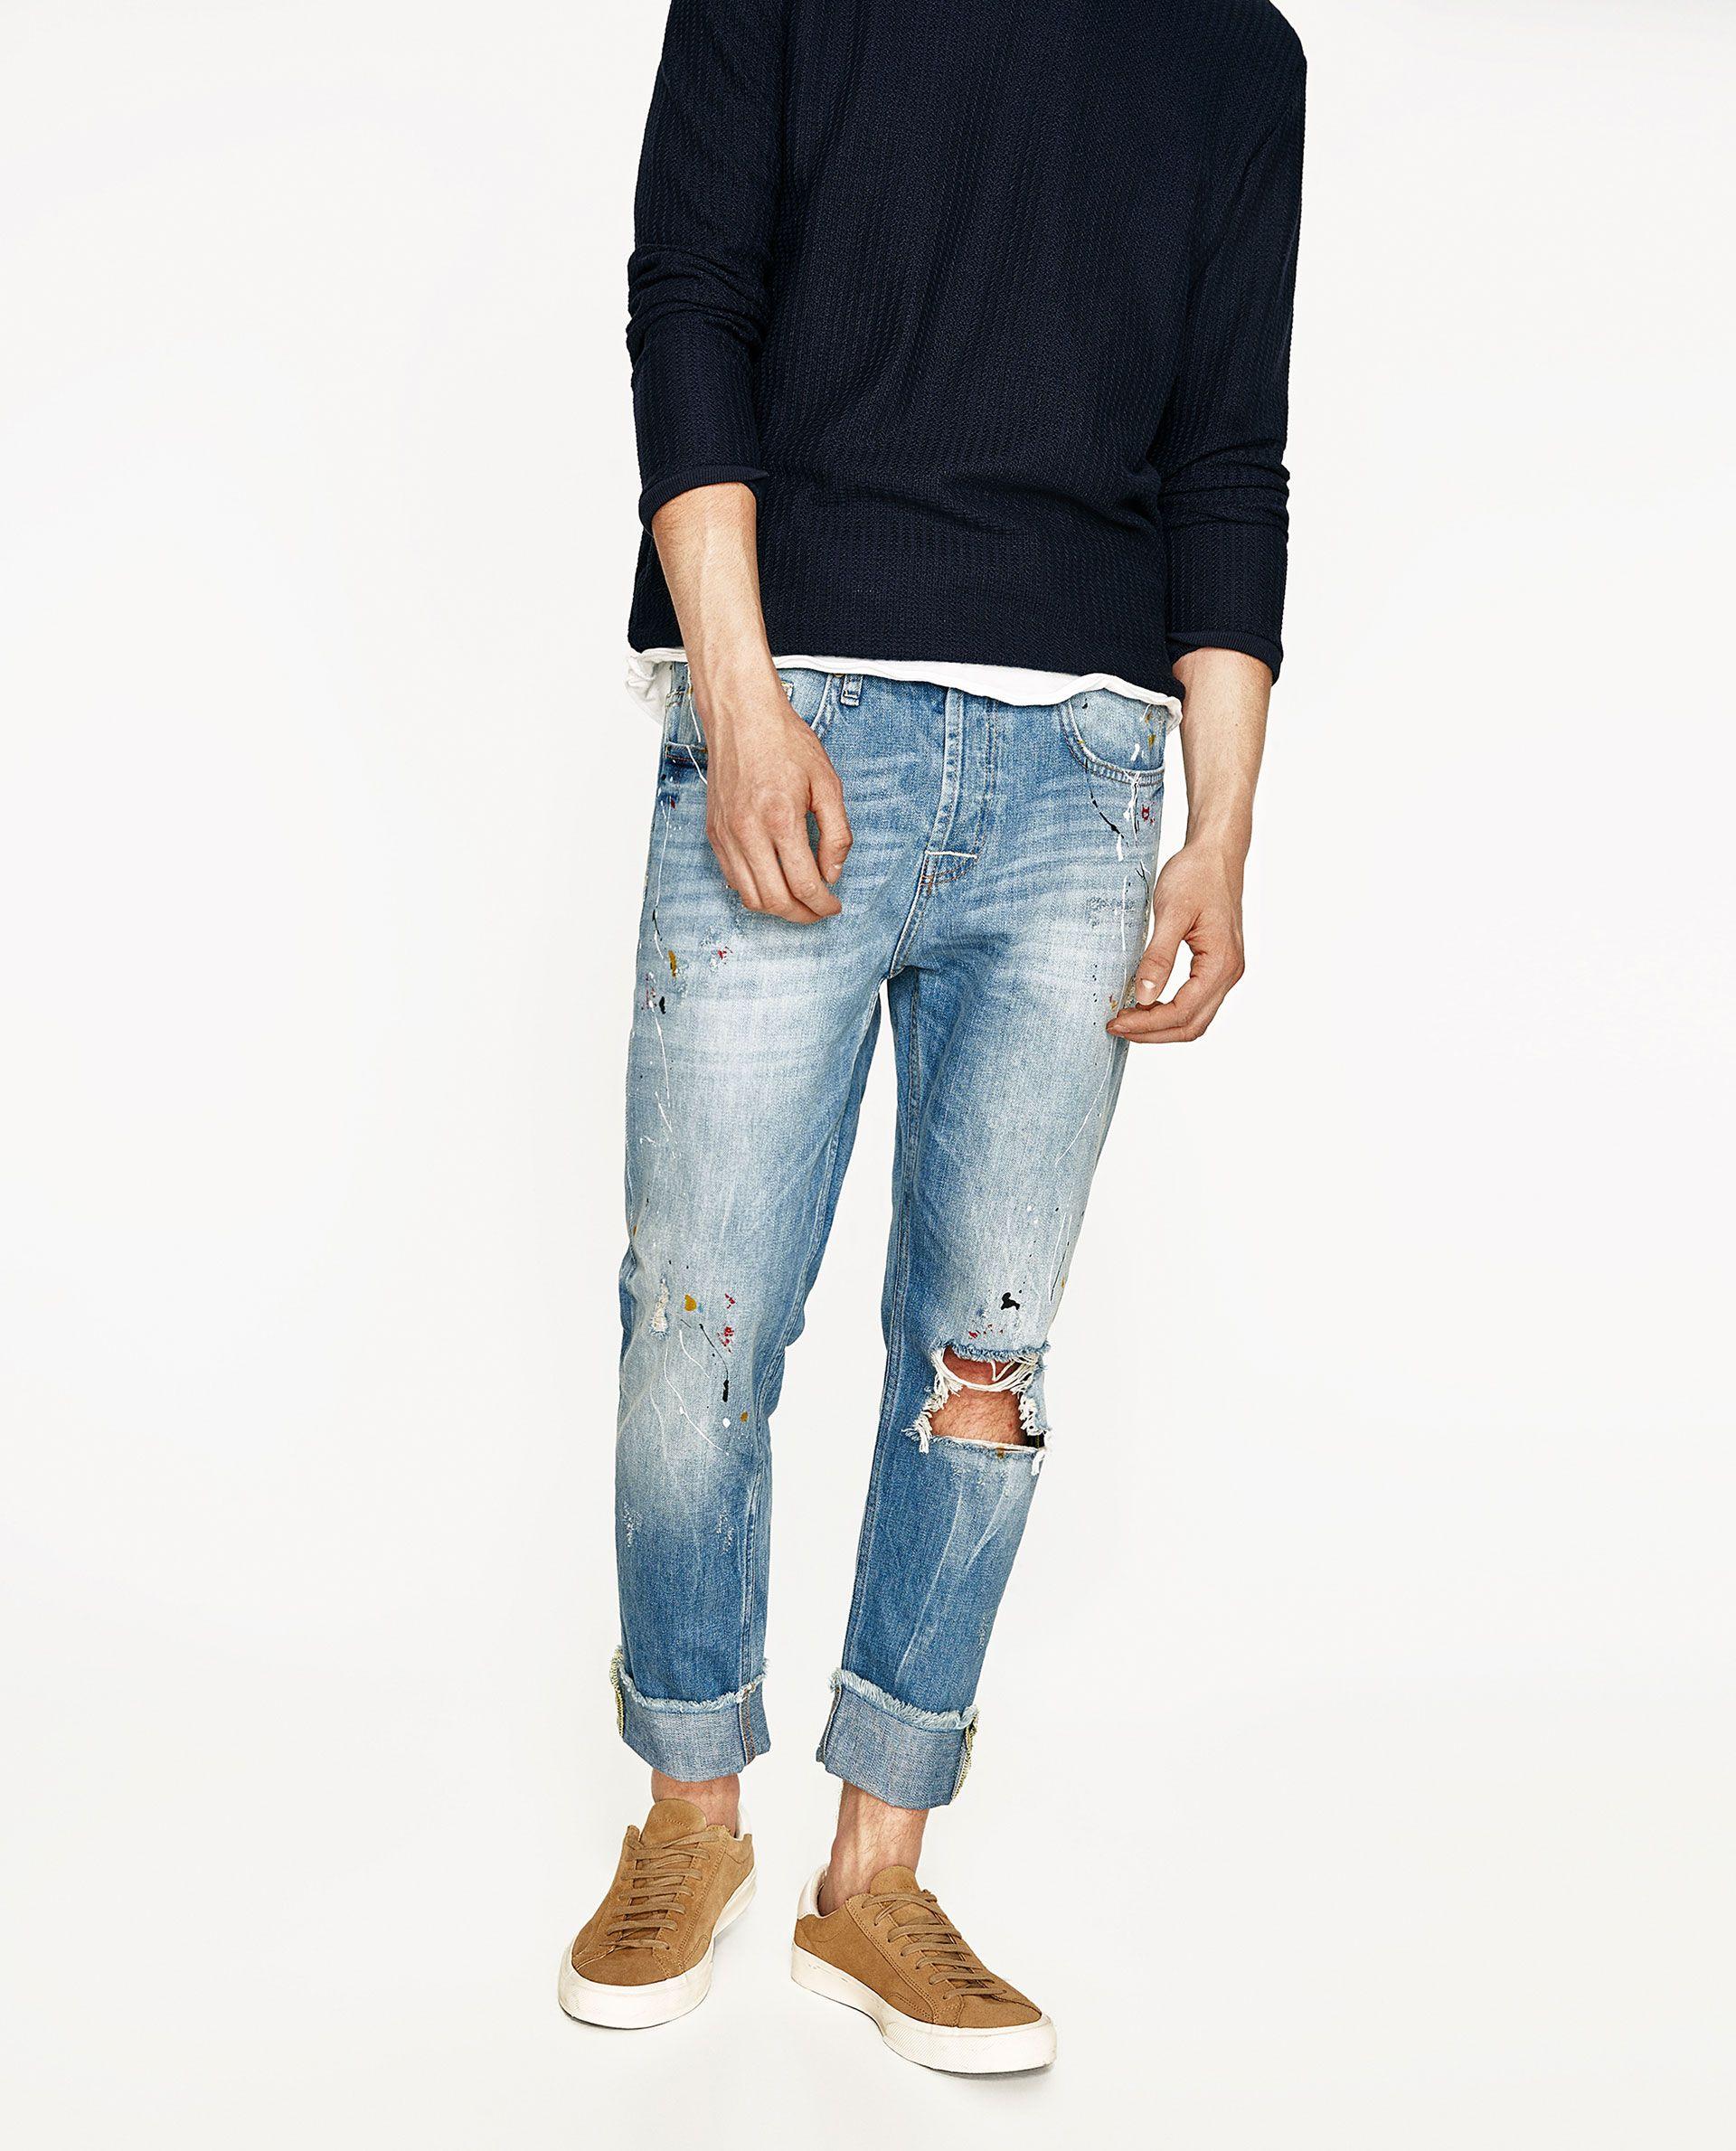 Imagen 2 De Pantalon Pintura Colores De Zara Denim Details Mens Denim Jeans